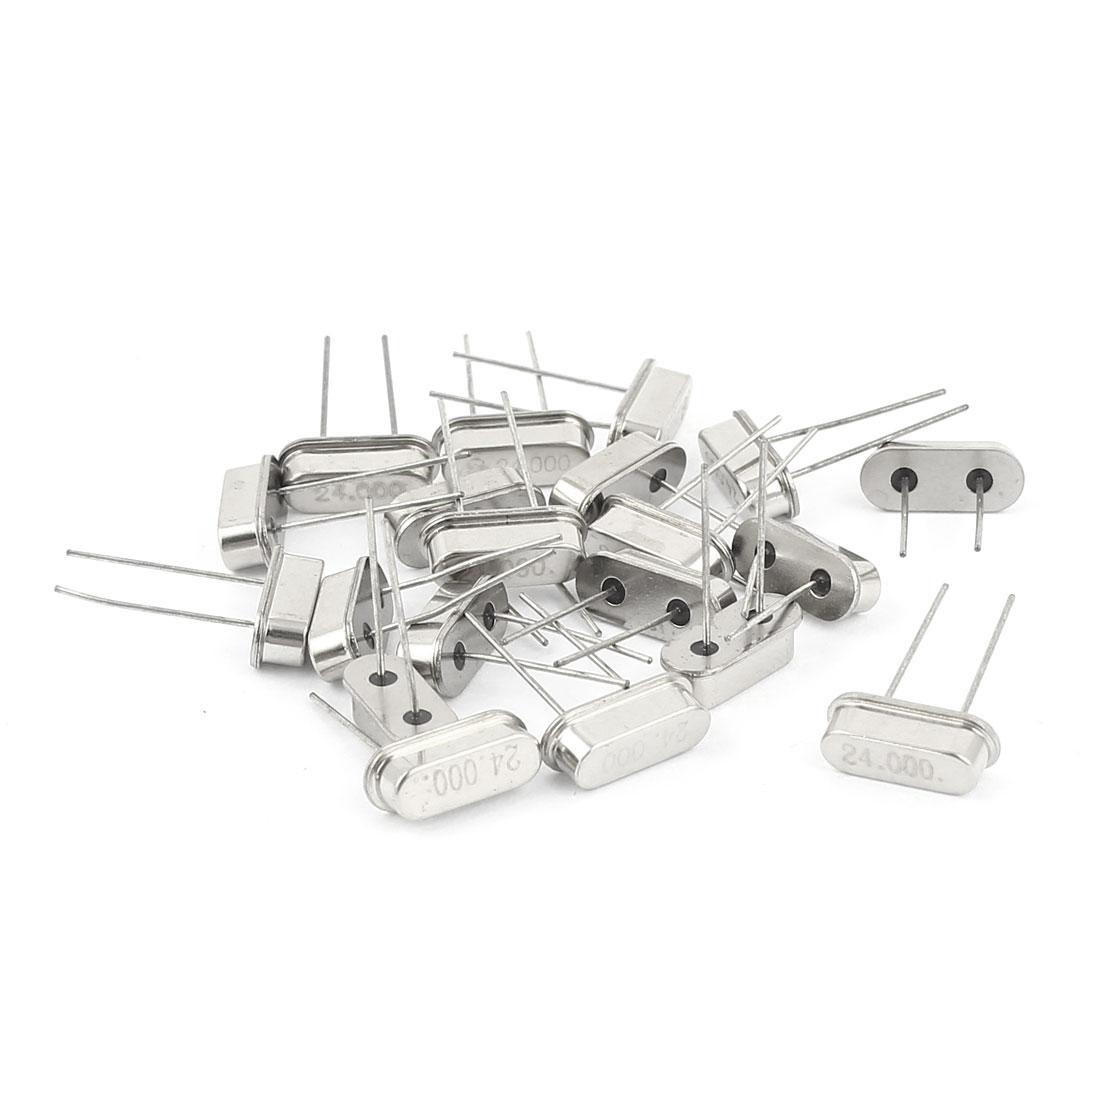 20 Pcs 24MHZ 24.000M 24M HZ Passive Quartz Crystal Oscillator Silver Tone HC-49S